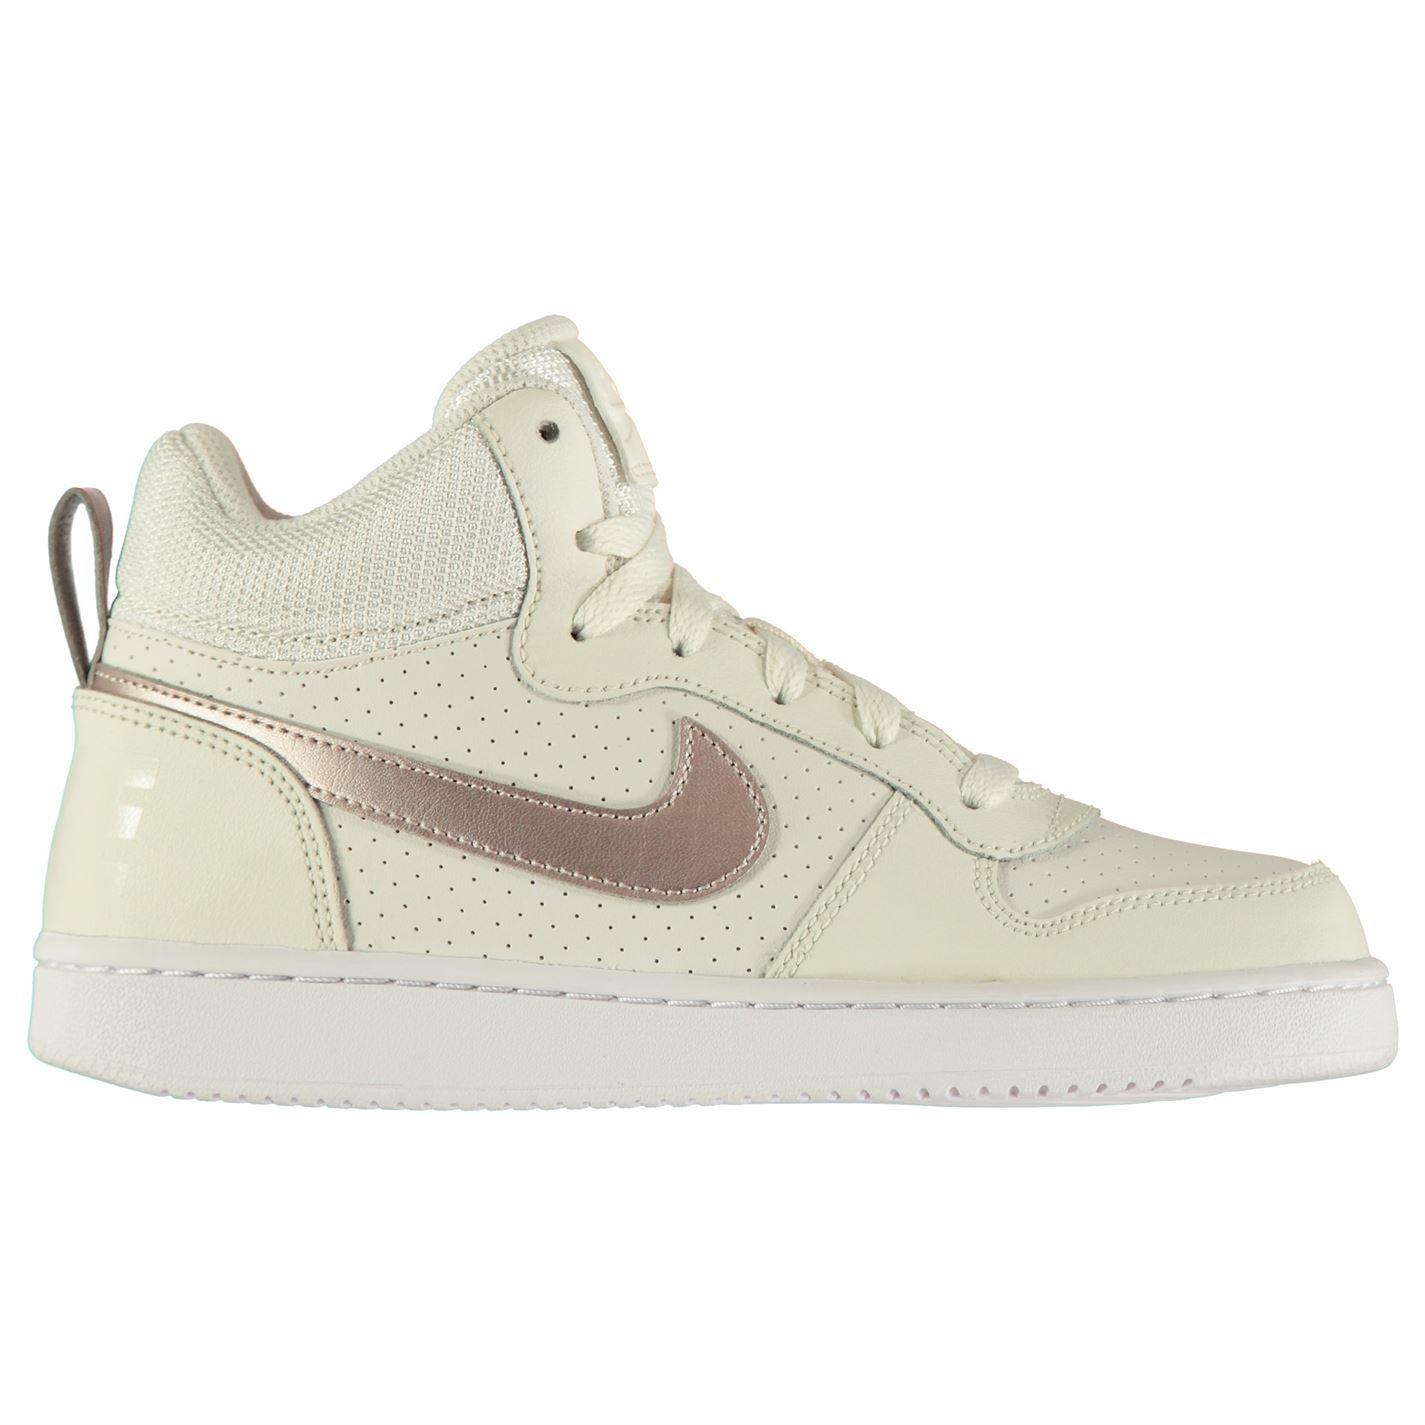 867c7021fea3f7 ... Nike Court Borough Junior Girls Mid Top Trainers Grey Bronze Shoes  Footwear ...